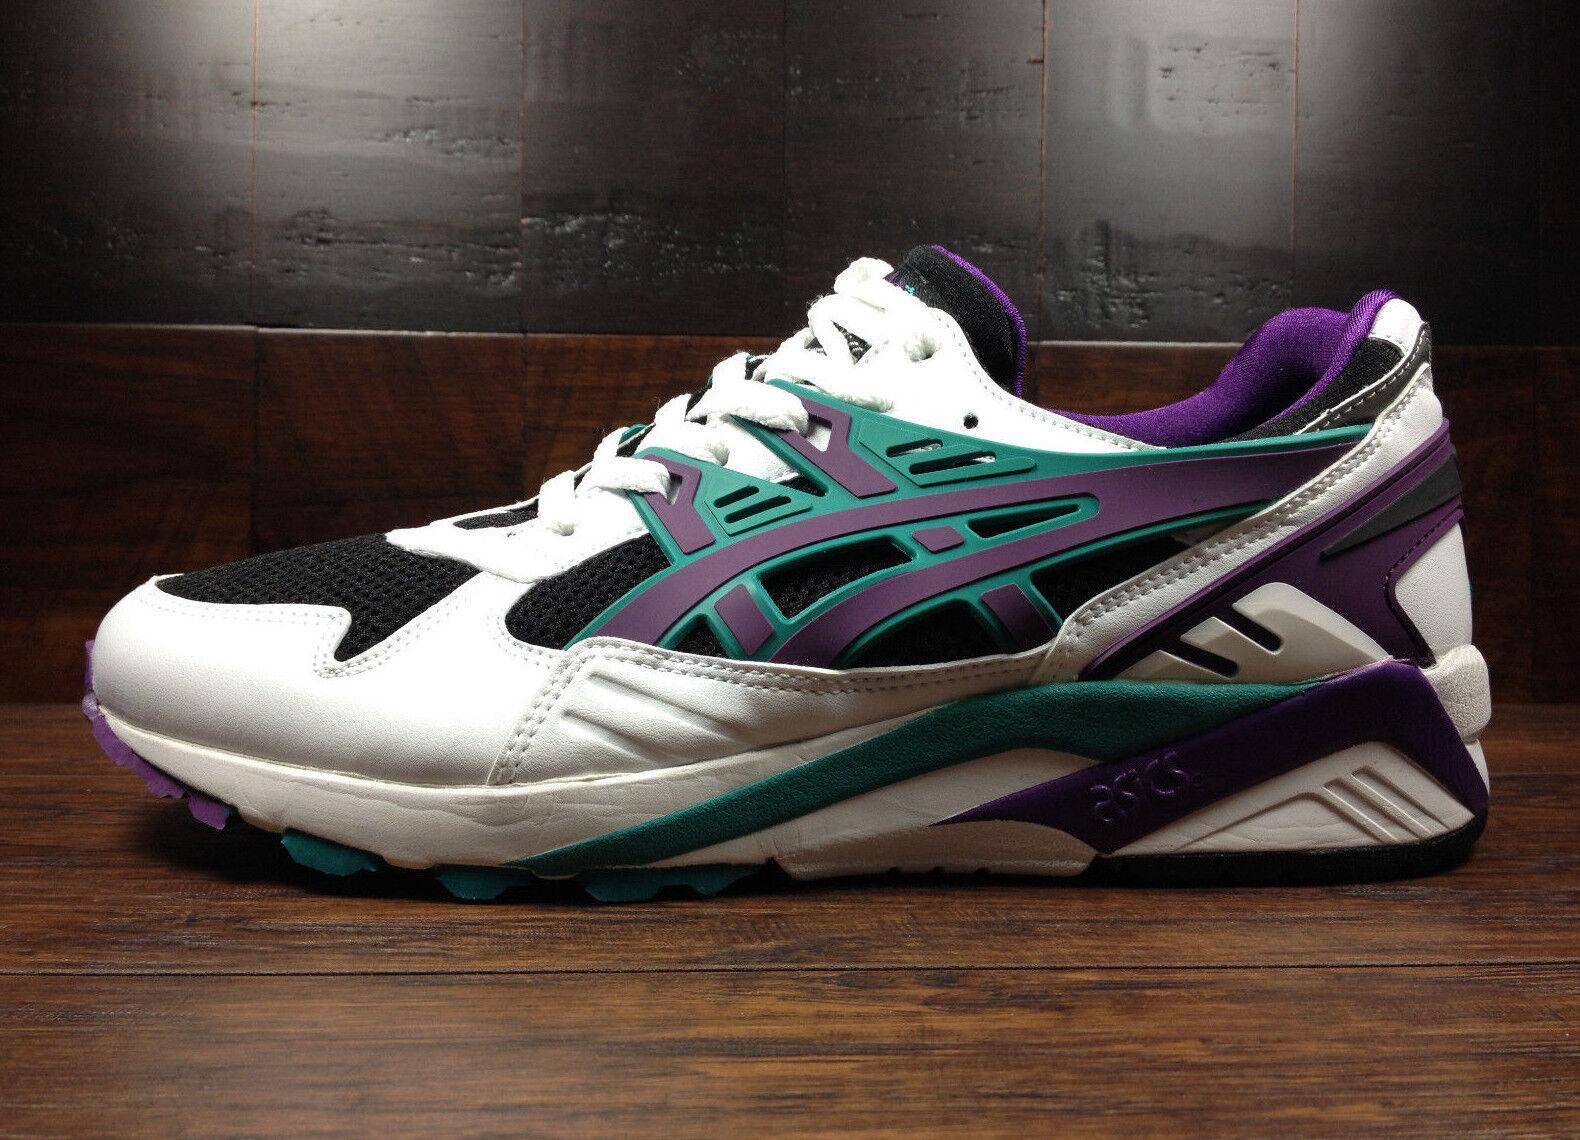 Asics GEL-Kayano Trainer (Negro blancoo púrpuraa) [H403N-9033] correr para hombre